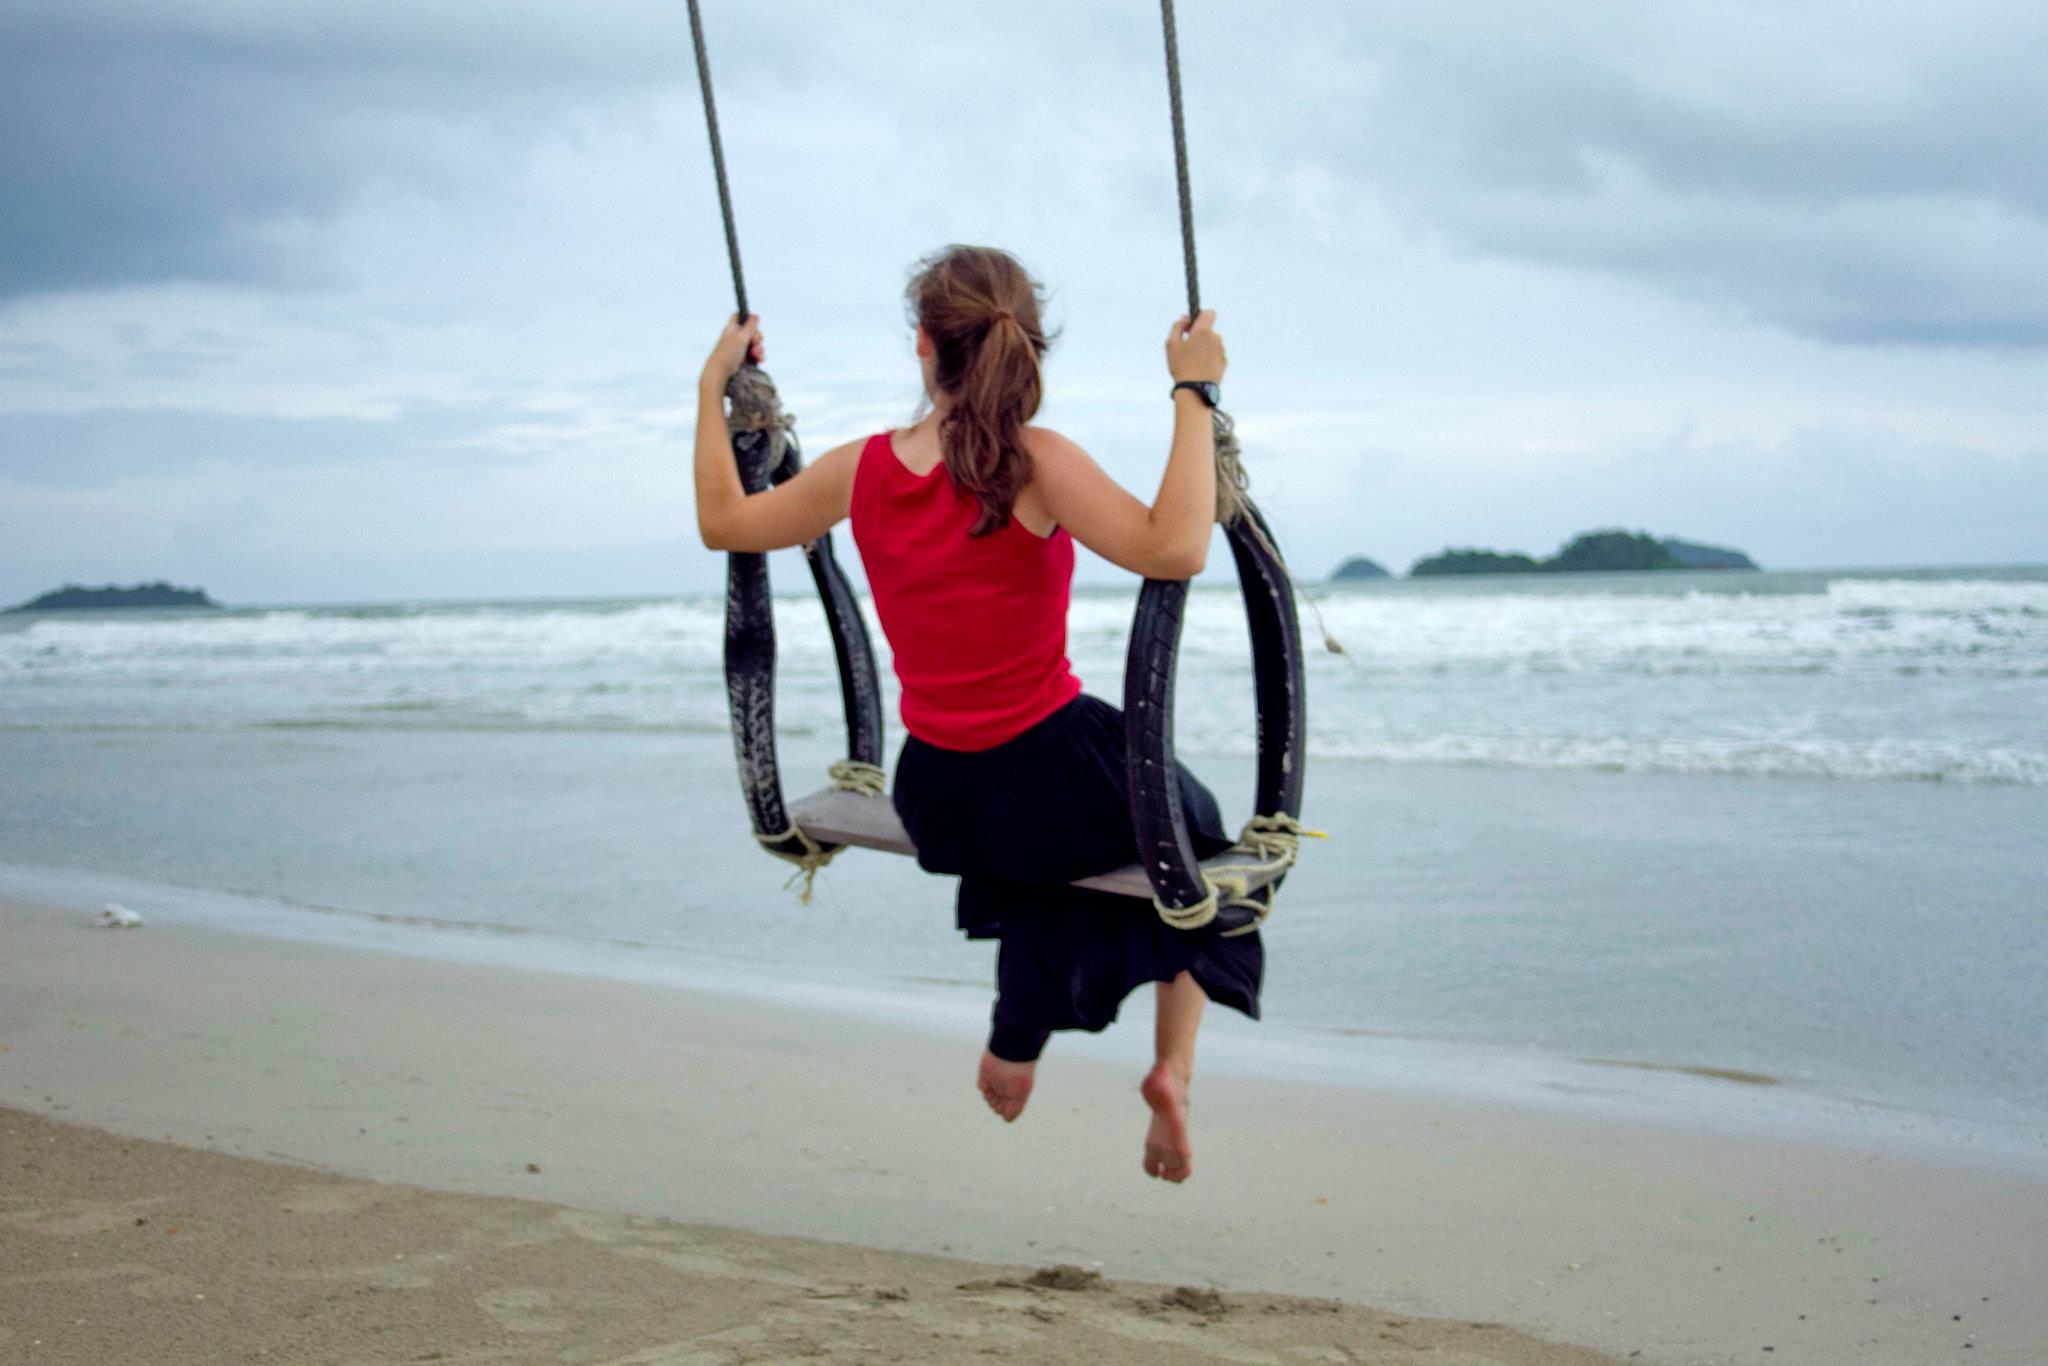 wandering_study_adventure_videographer_thailand_koh_chang_beach_swing